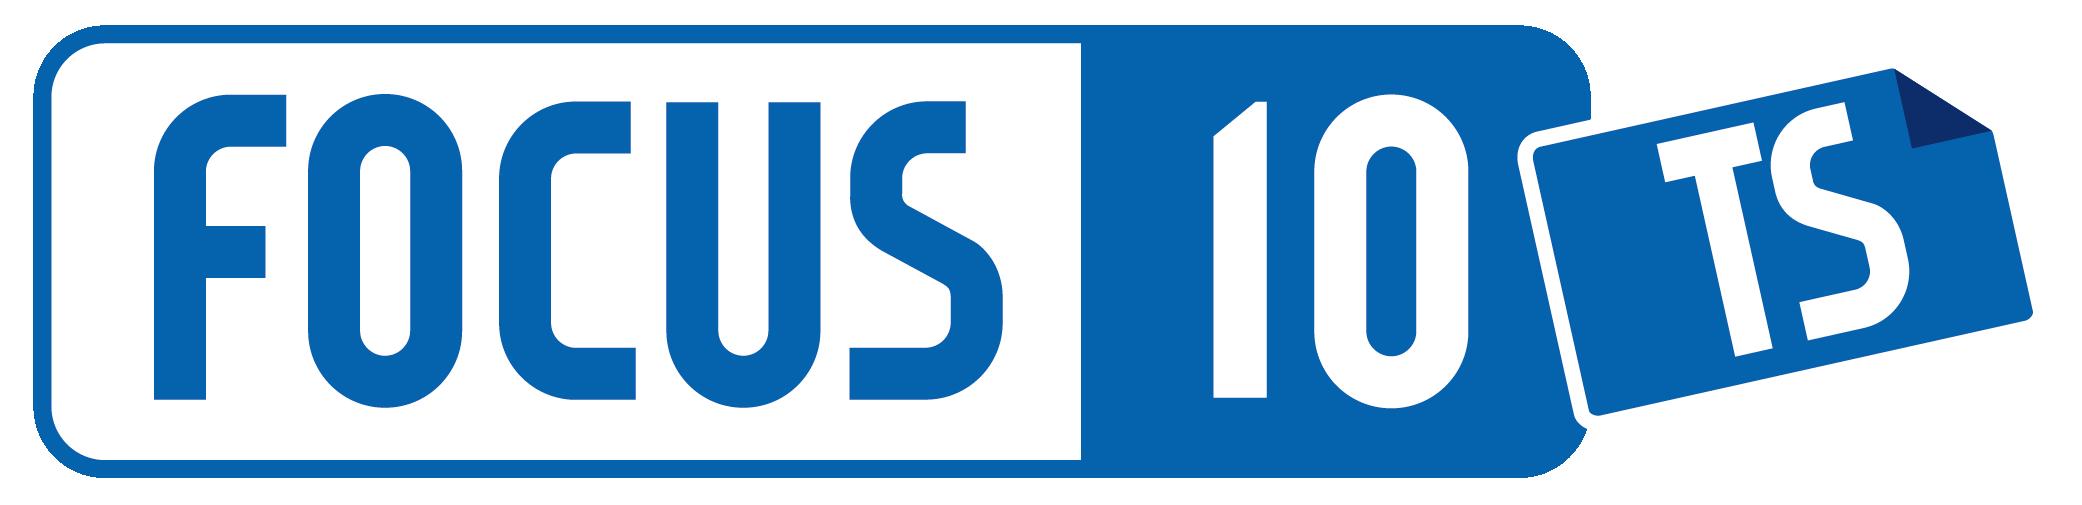 FOCUS 10 TS tessera sanitaria